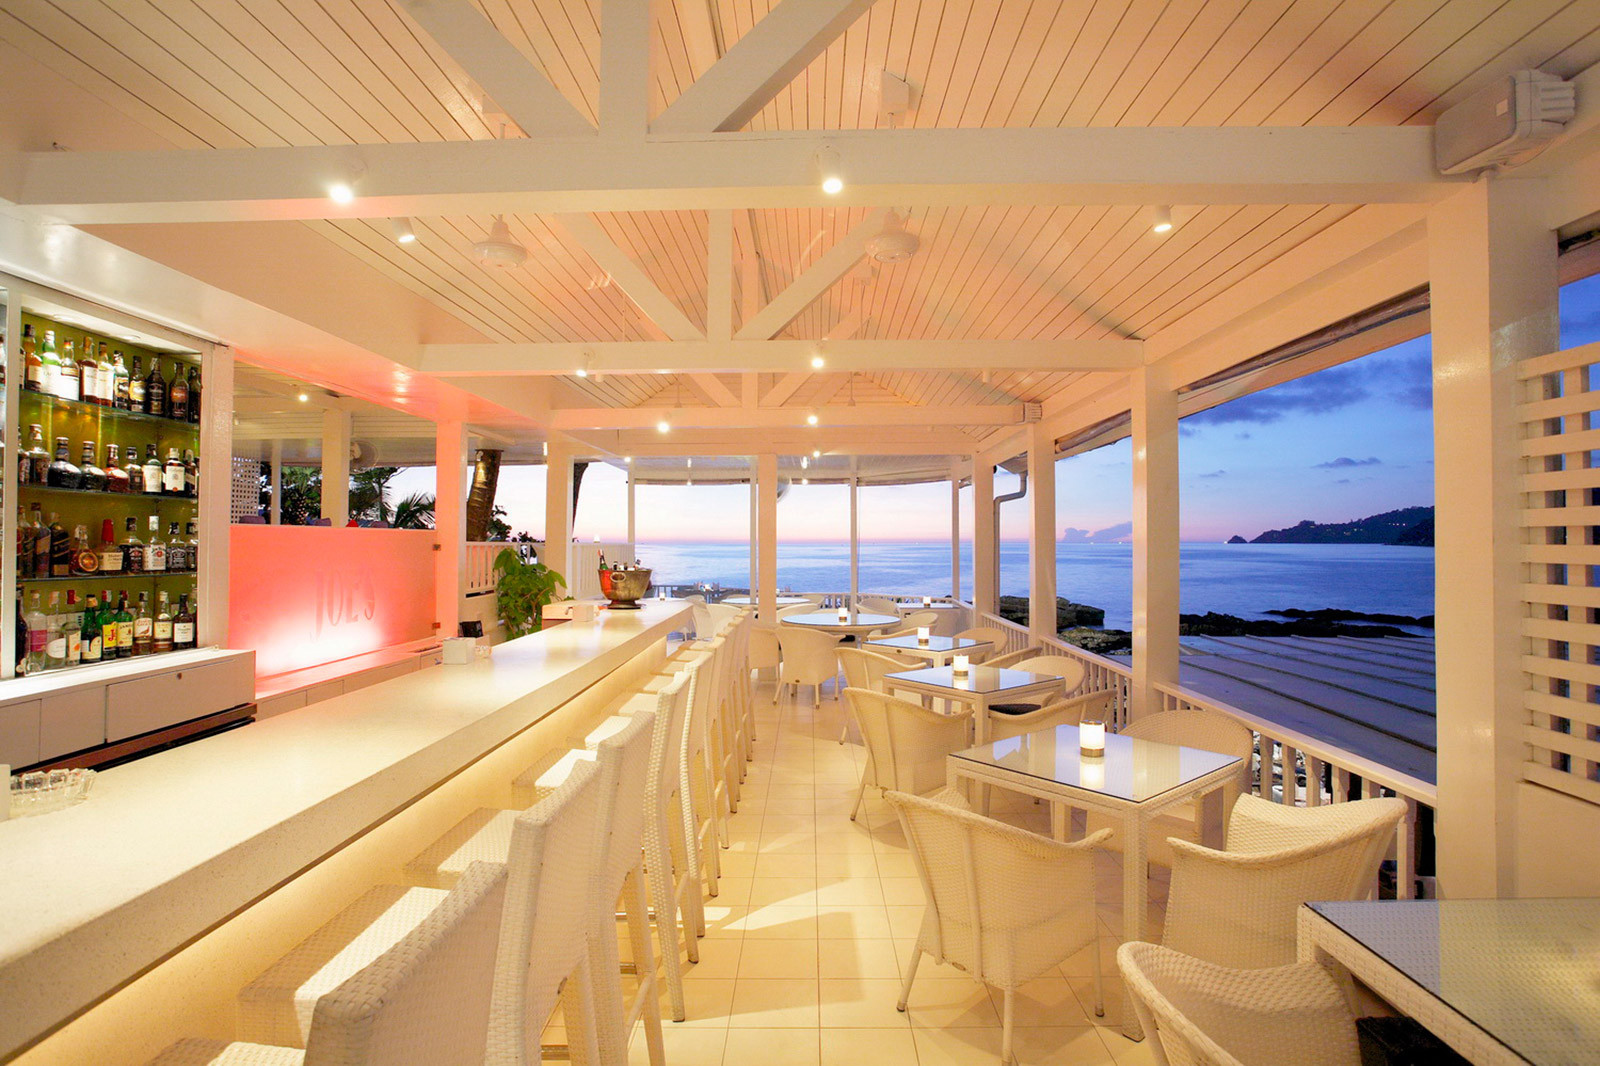 Joe's Downstairs Phuket | Kata Rocks Resort Phuket Thailand